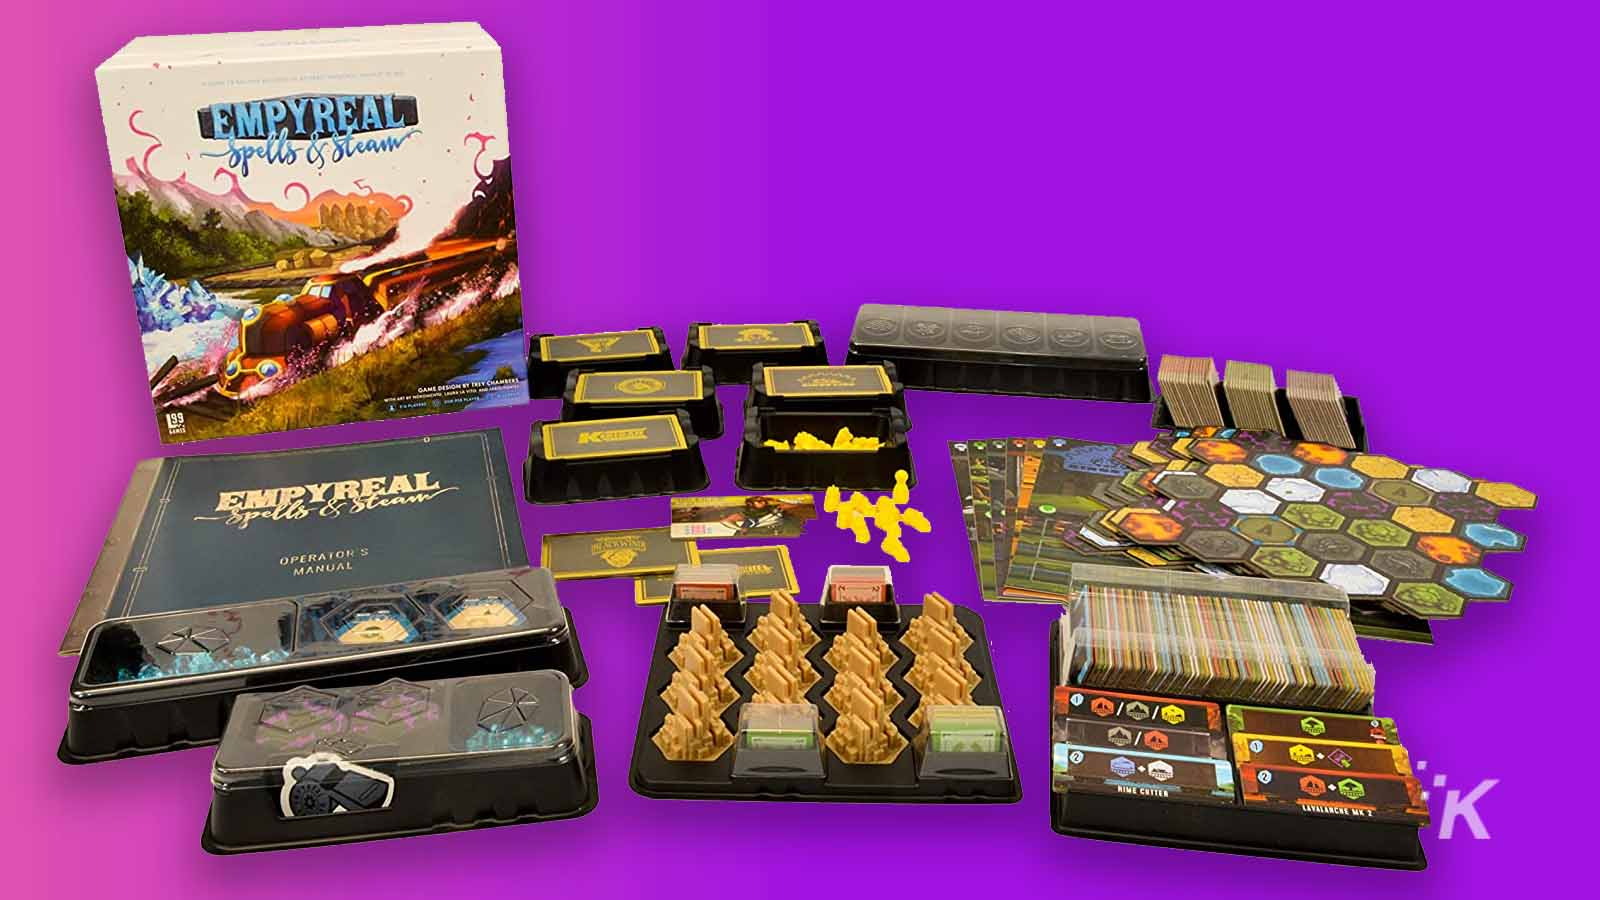 empyreal board game